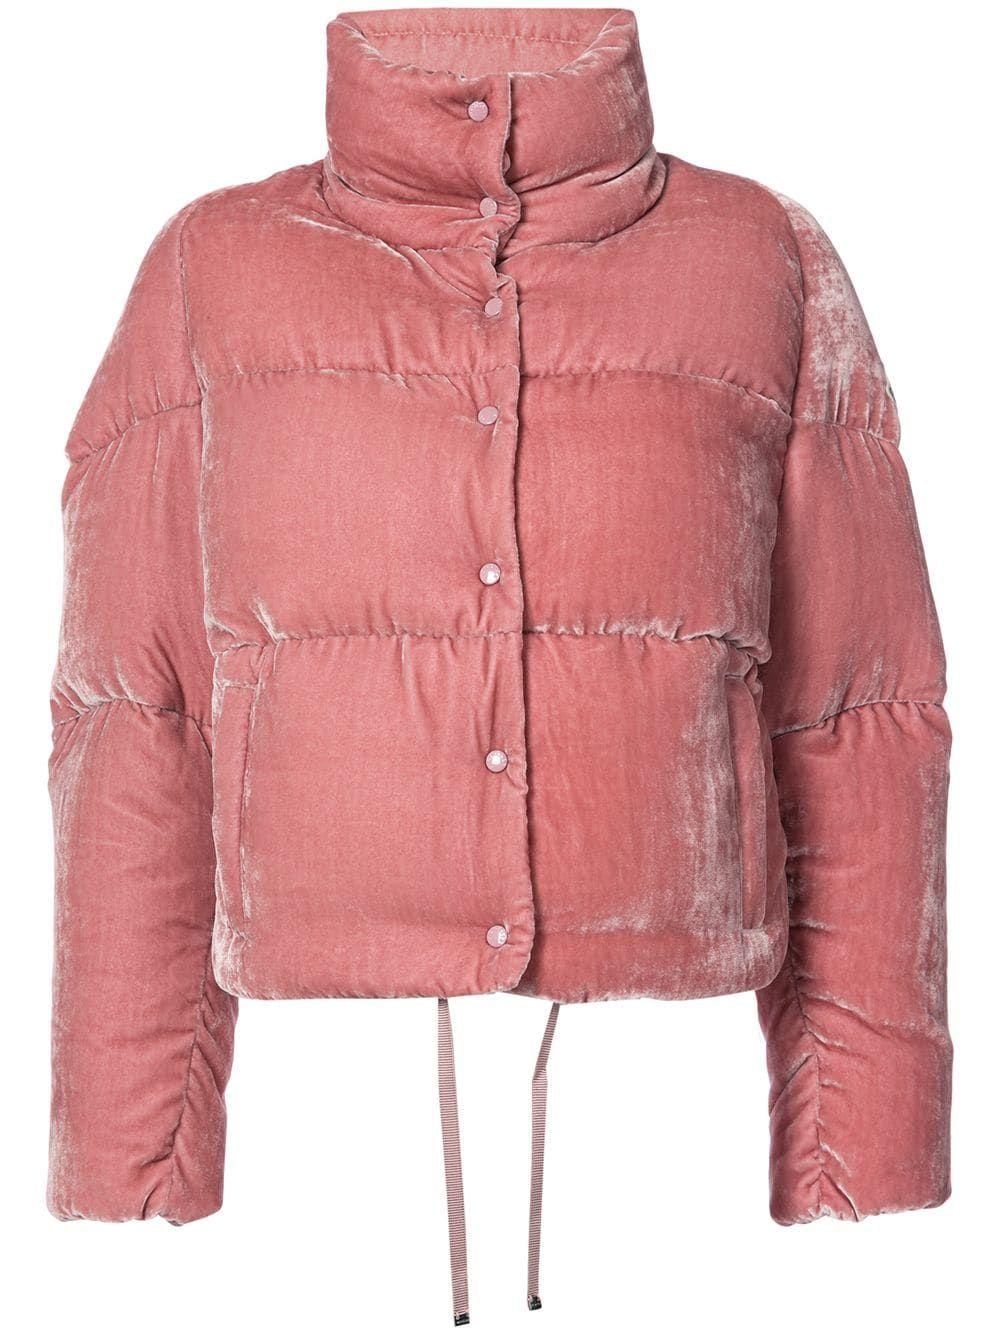 07a03a1c Moncler укороченная бархатная куртка-пуховик | Куртка in 2019 ...